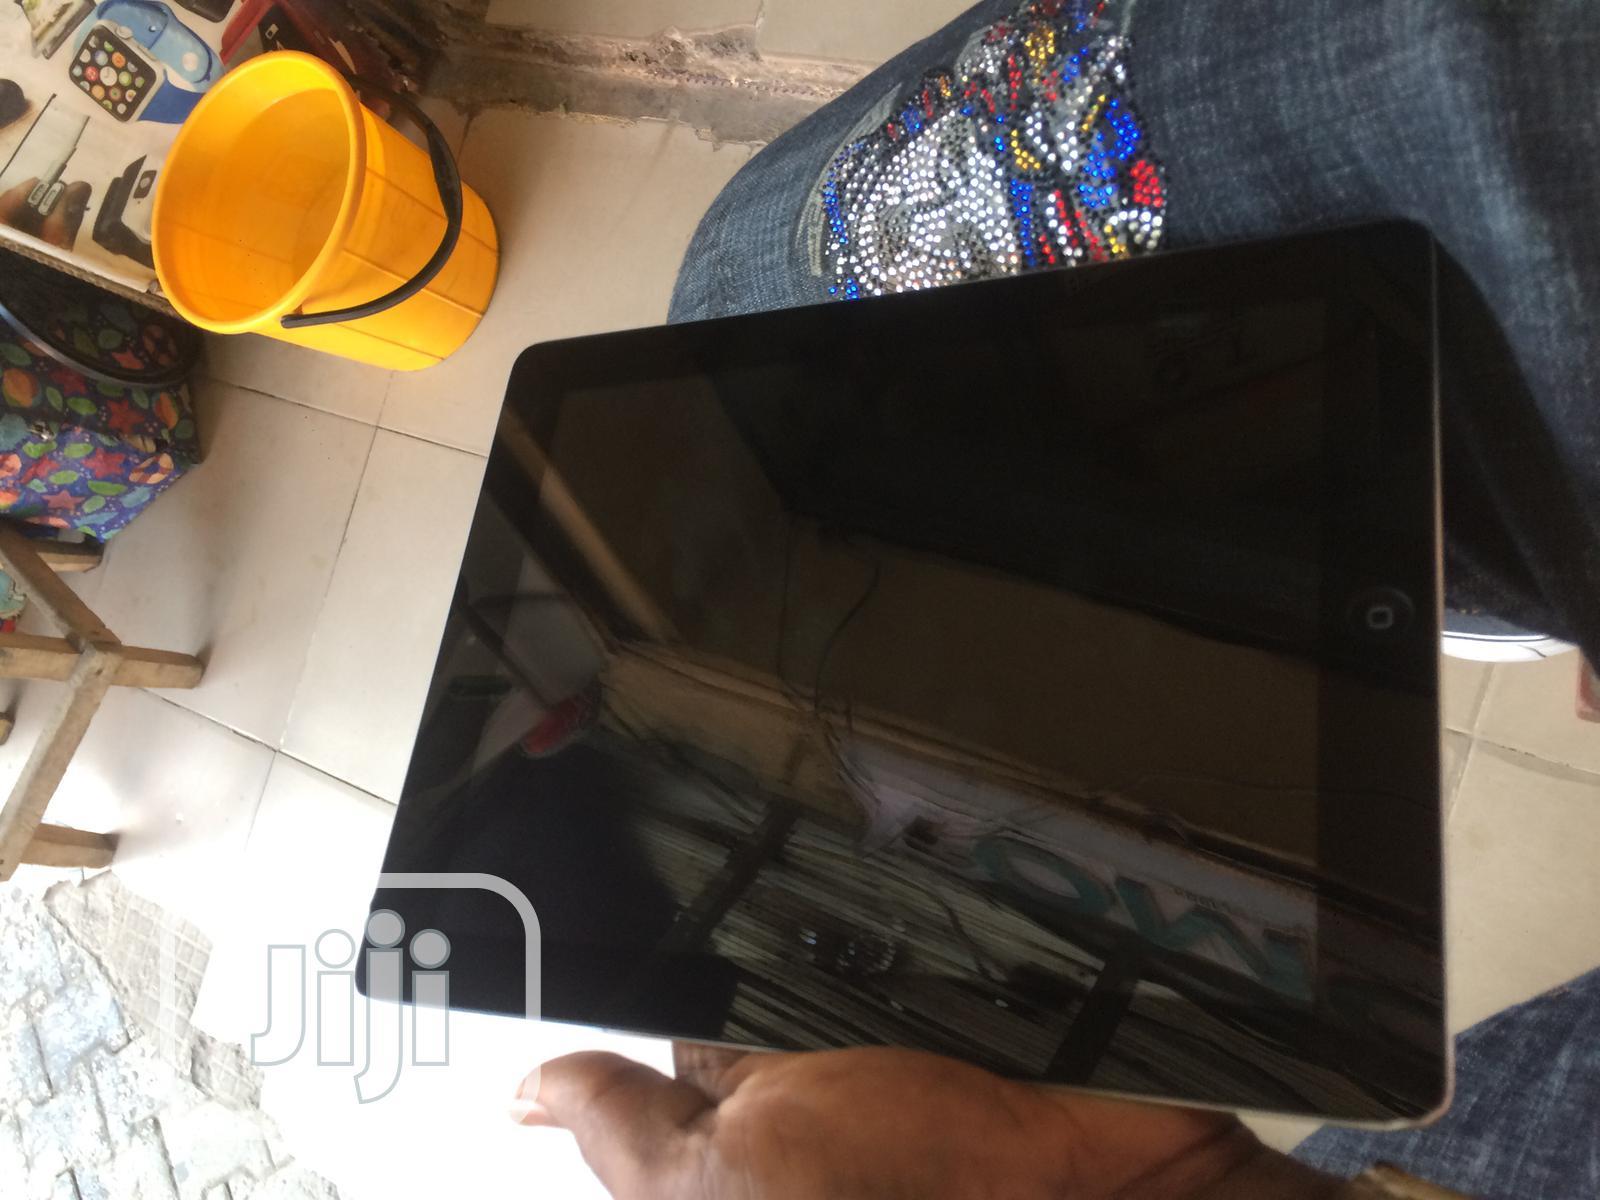 Archive: Apple iPad 4 Wi-Fi 16 GB Silver